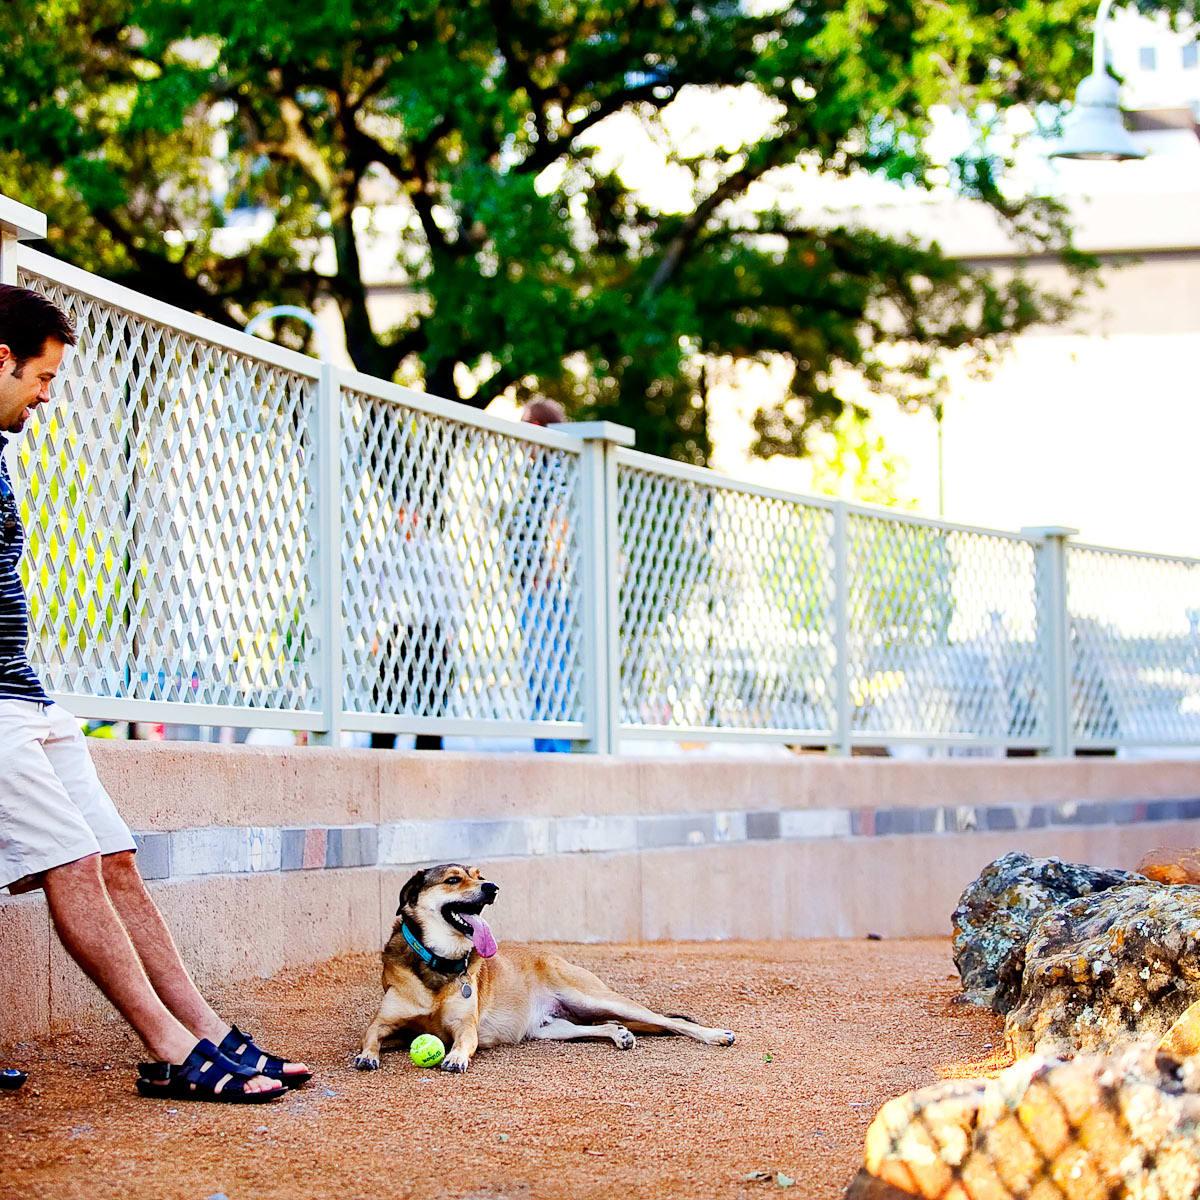 News_Market Square Park_dog run